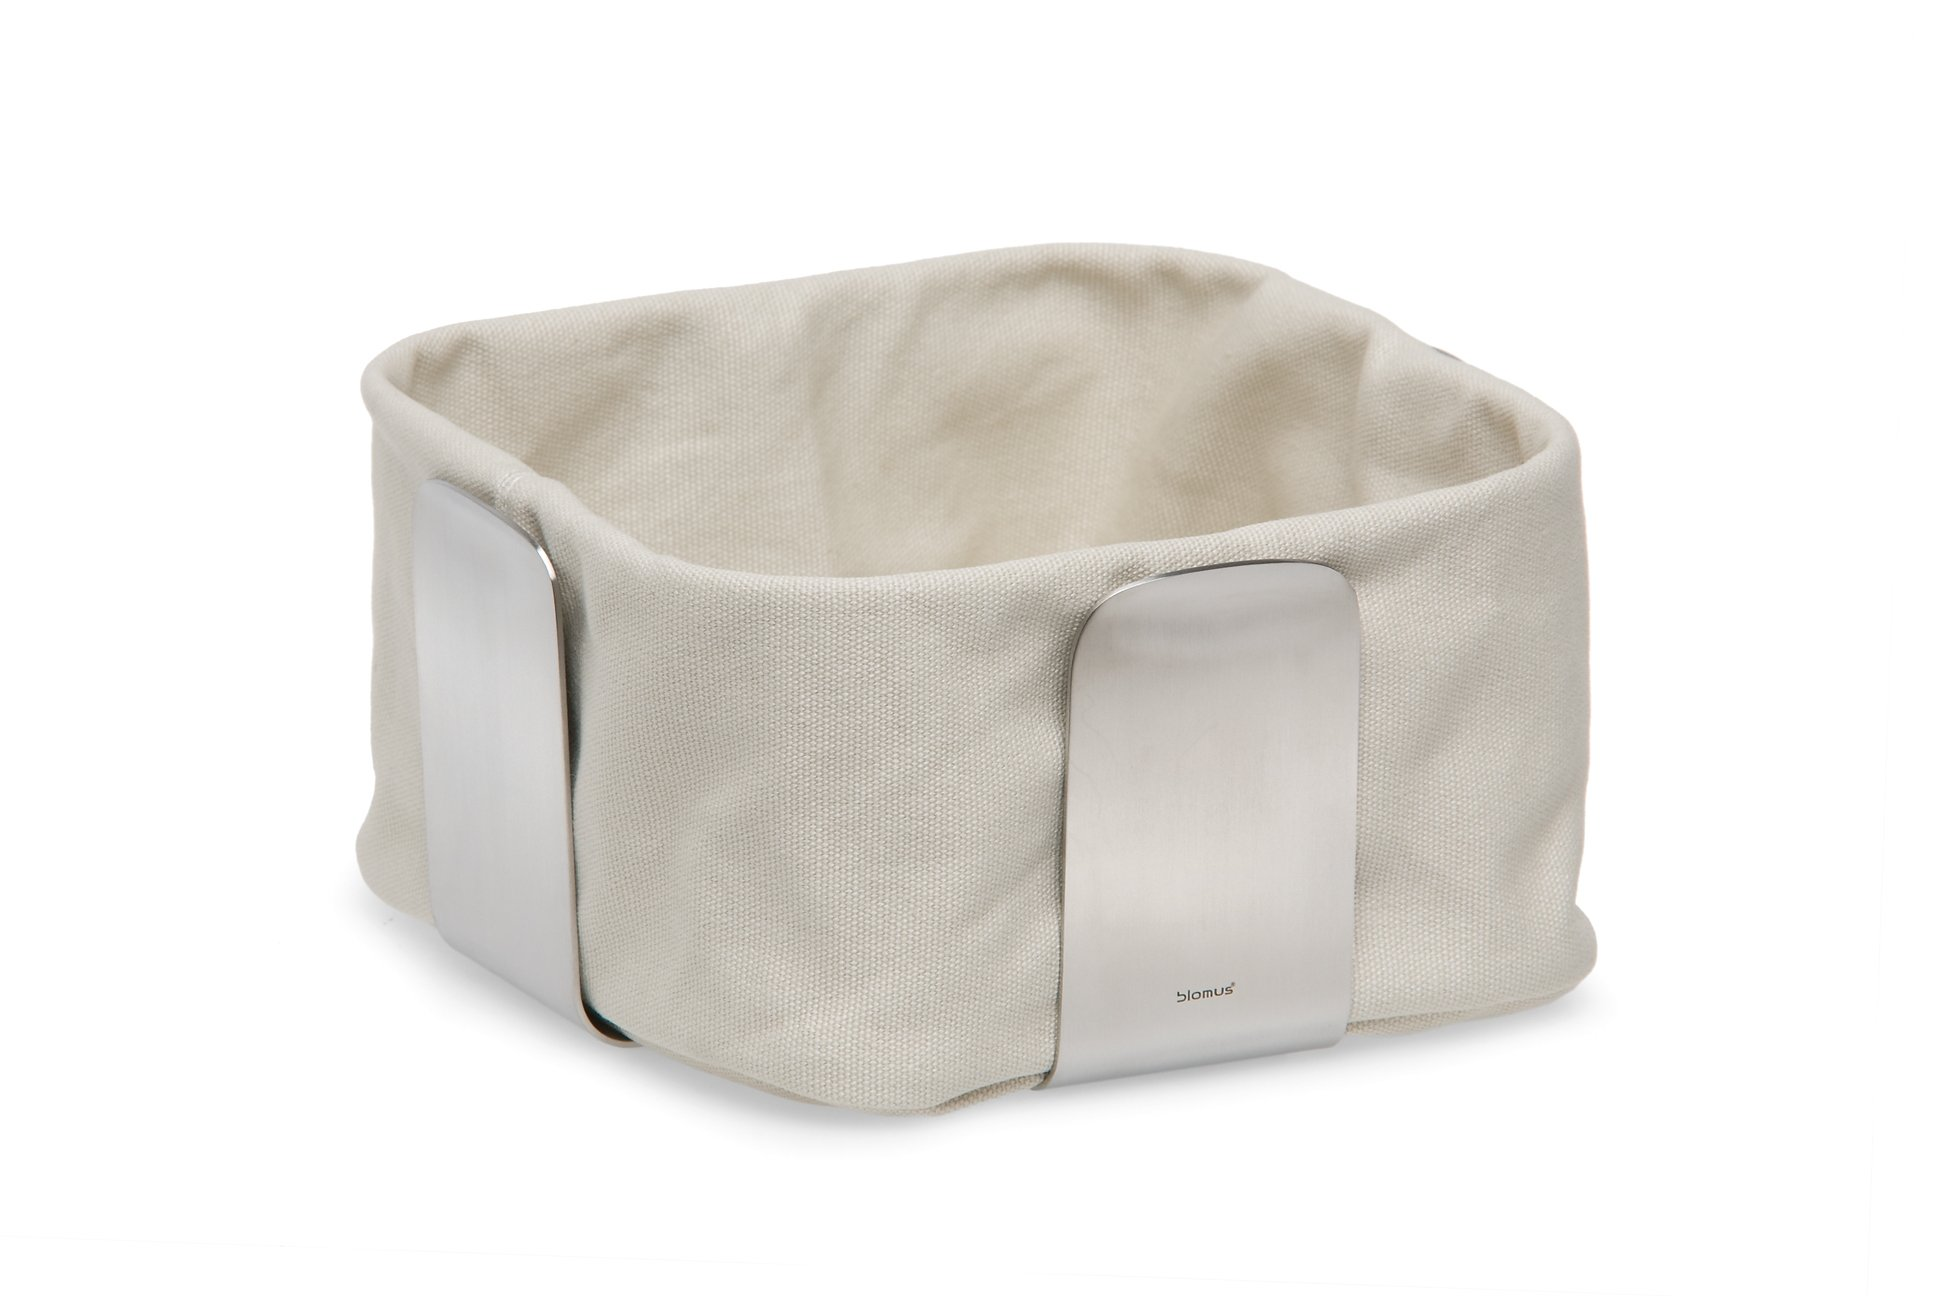 Blomus Small Bread Basket, Sand